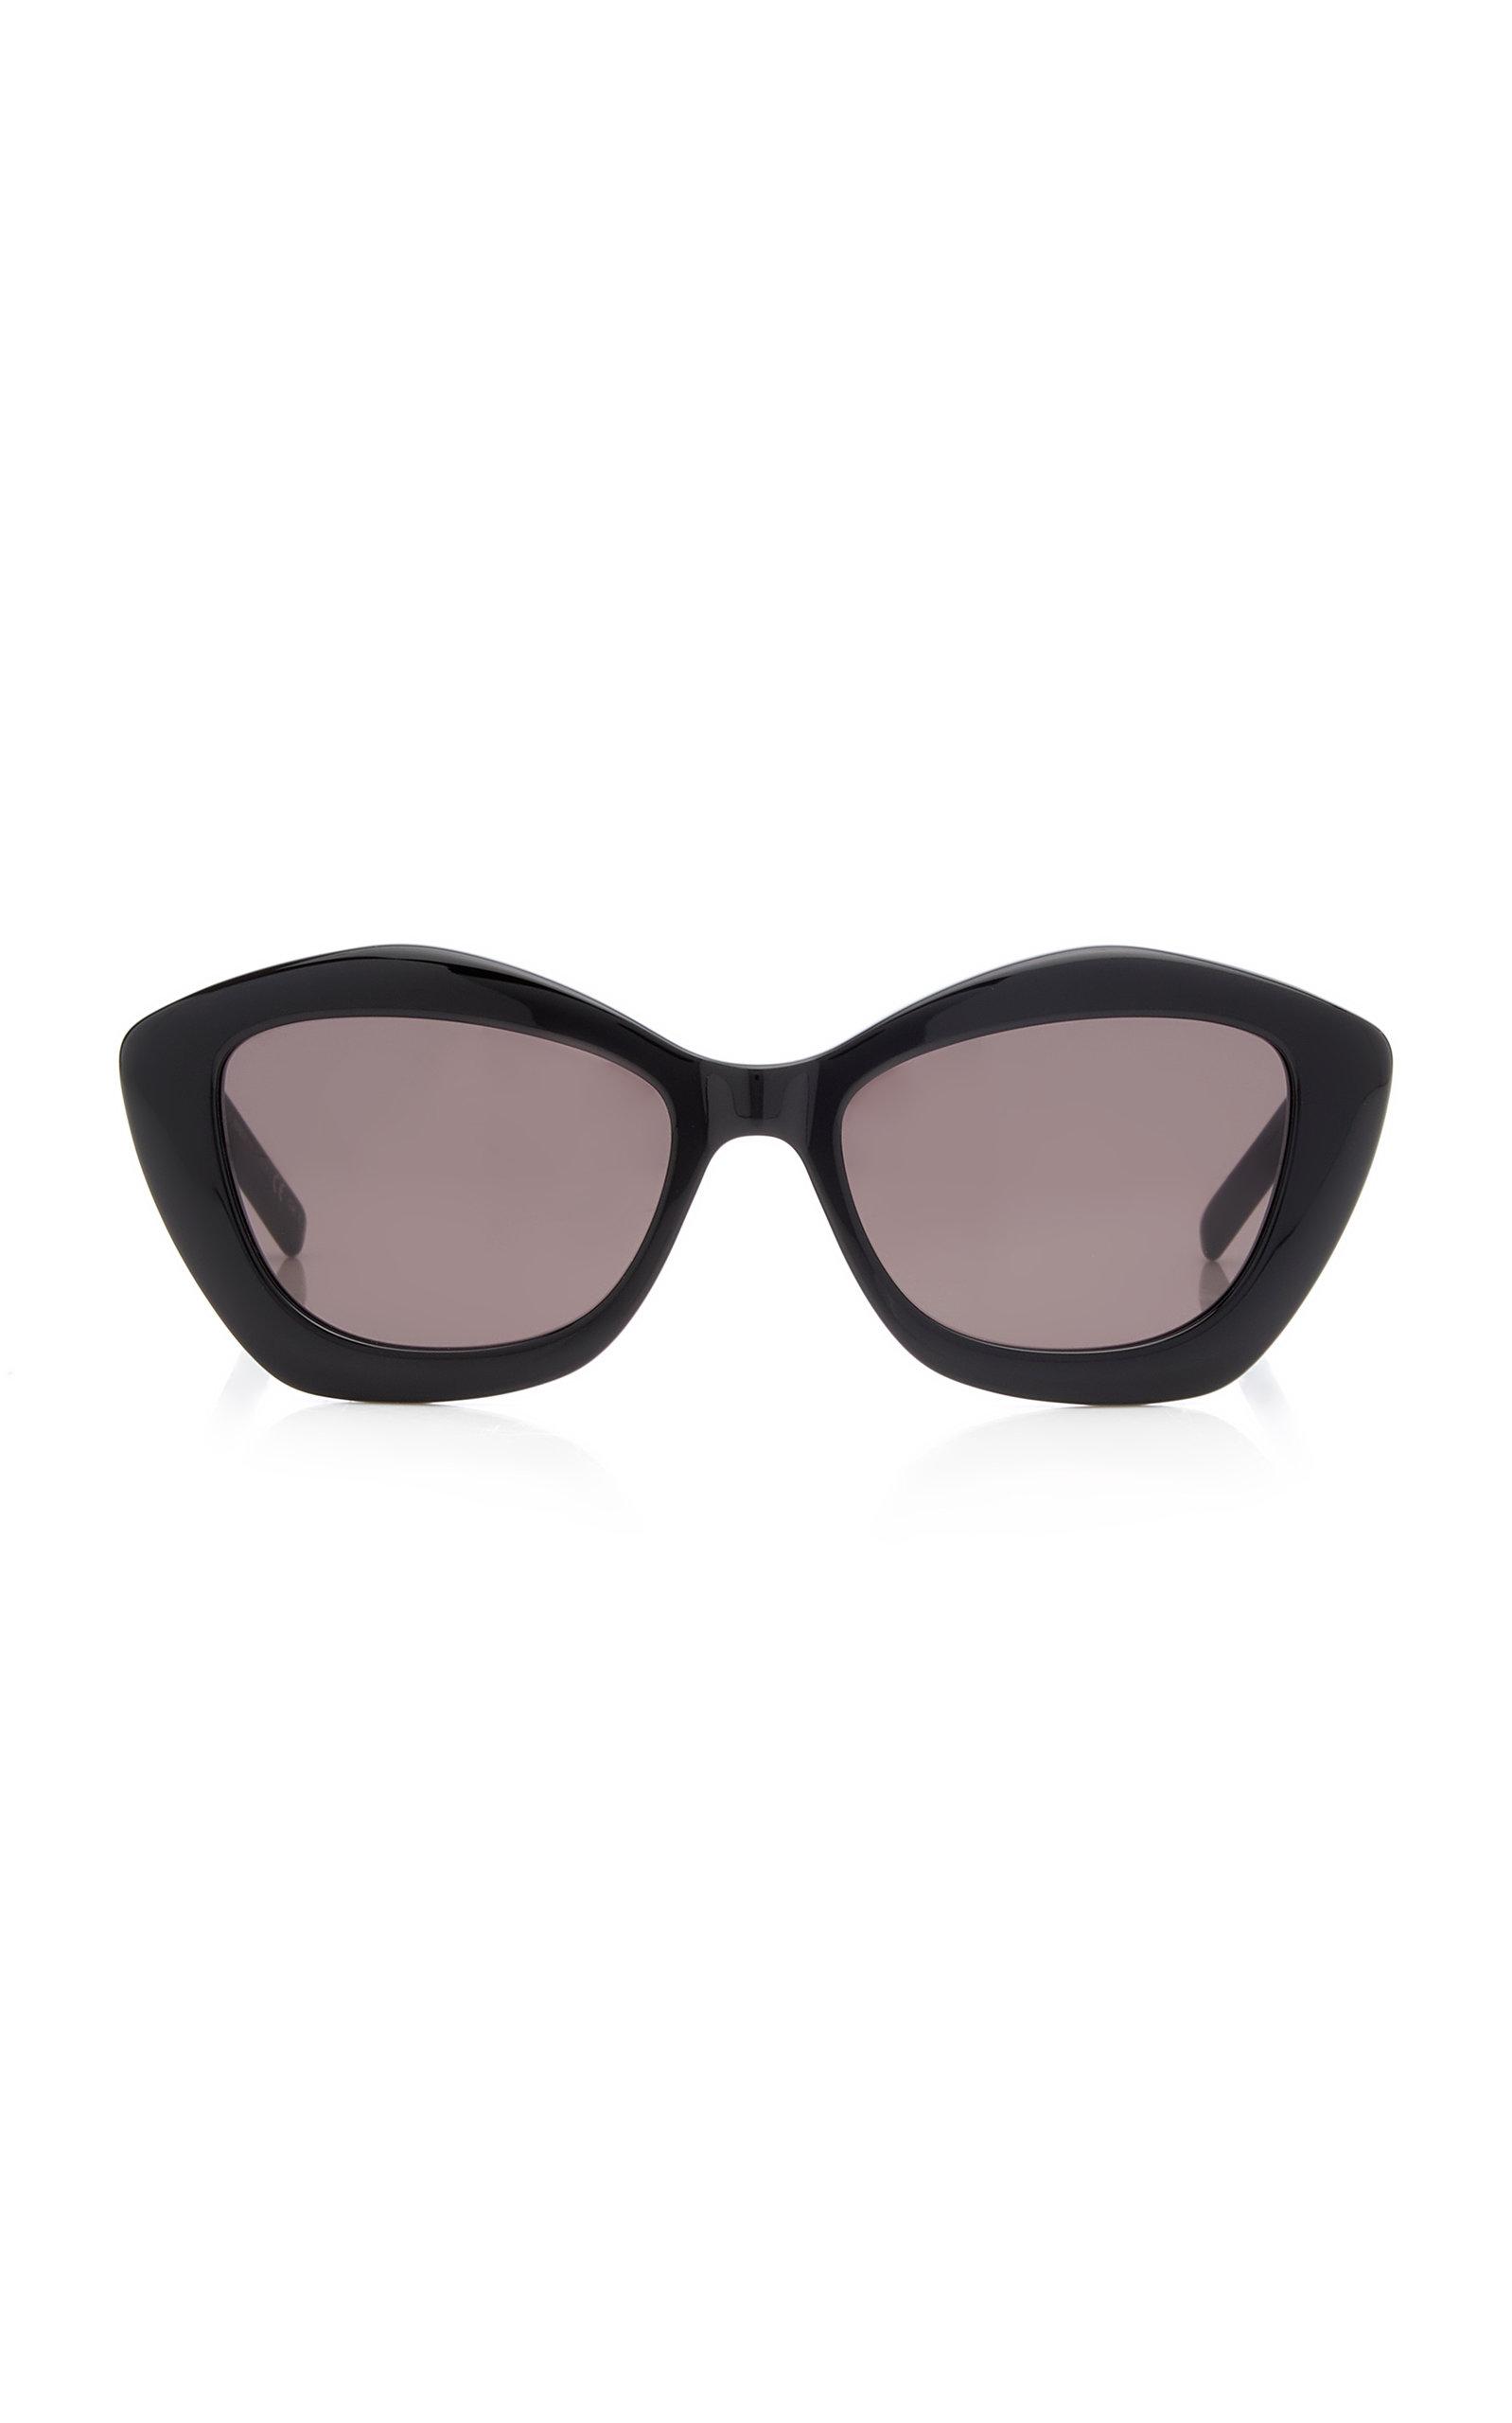 Saint Laurent - Women's Cat-Eye Acetate Sunglasses - Black/white - Moda Operandi